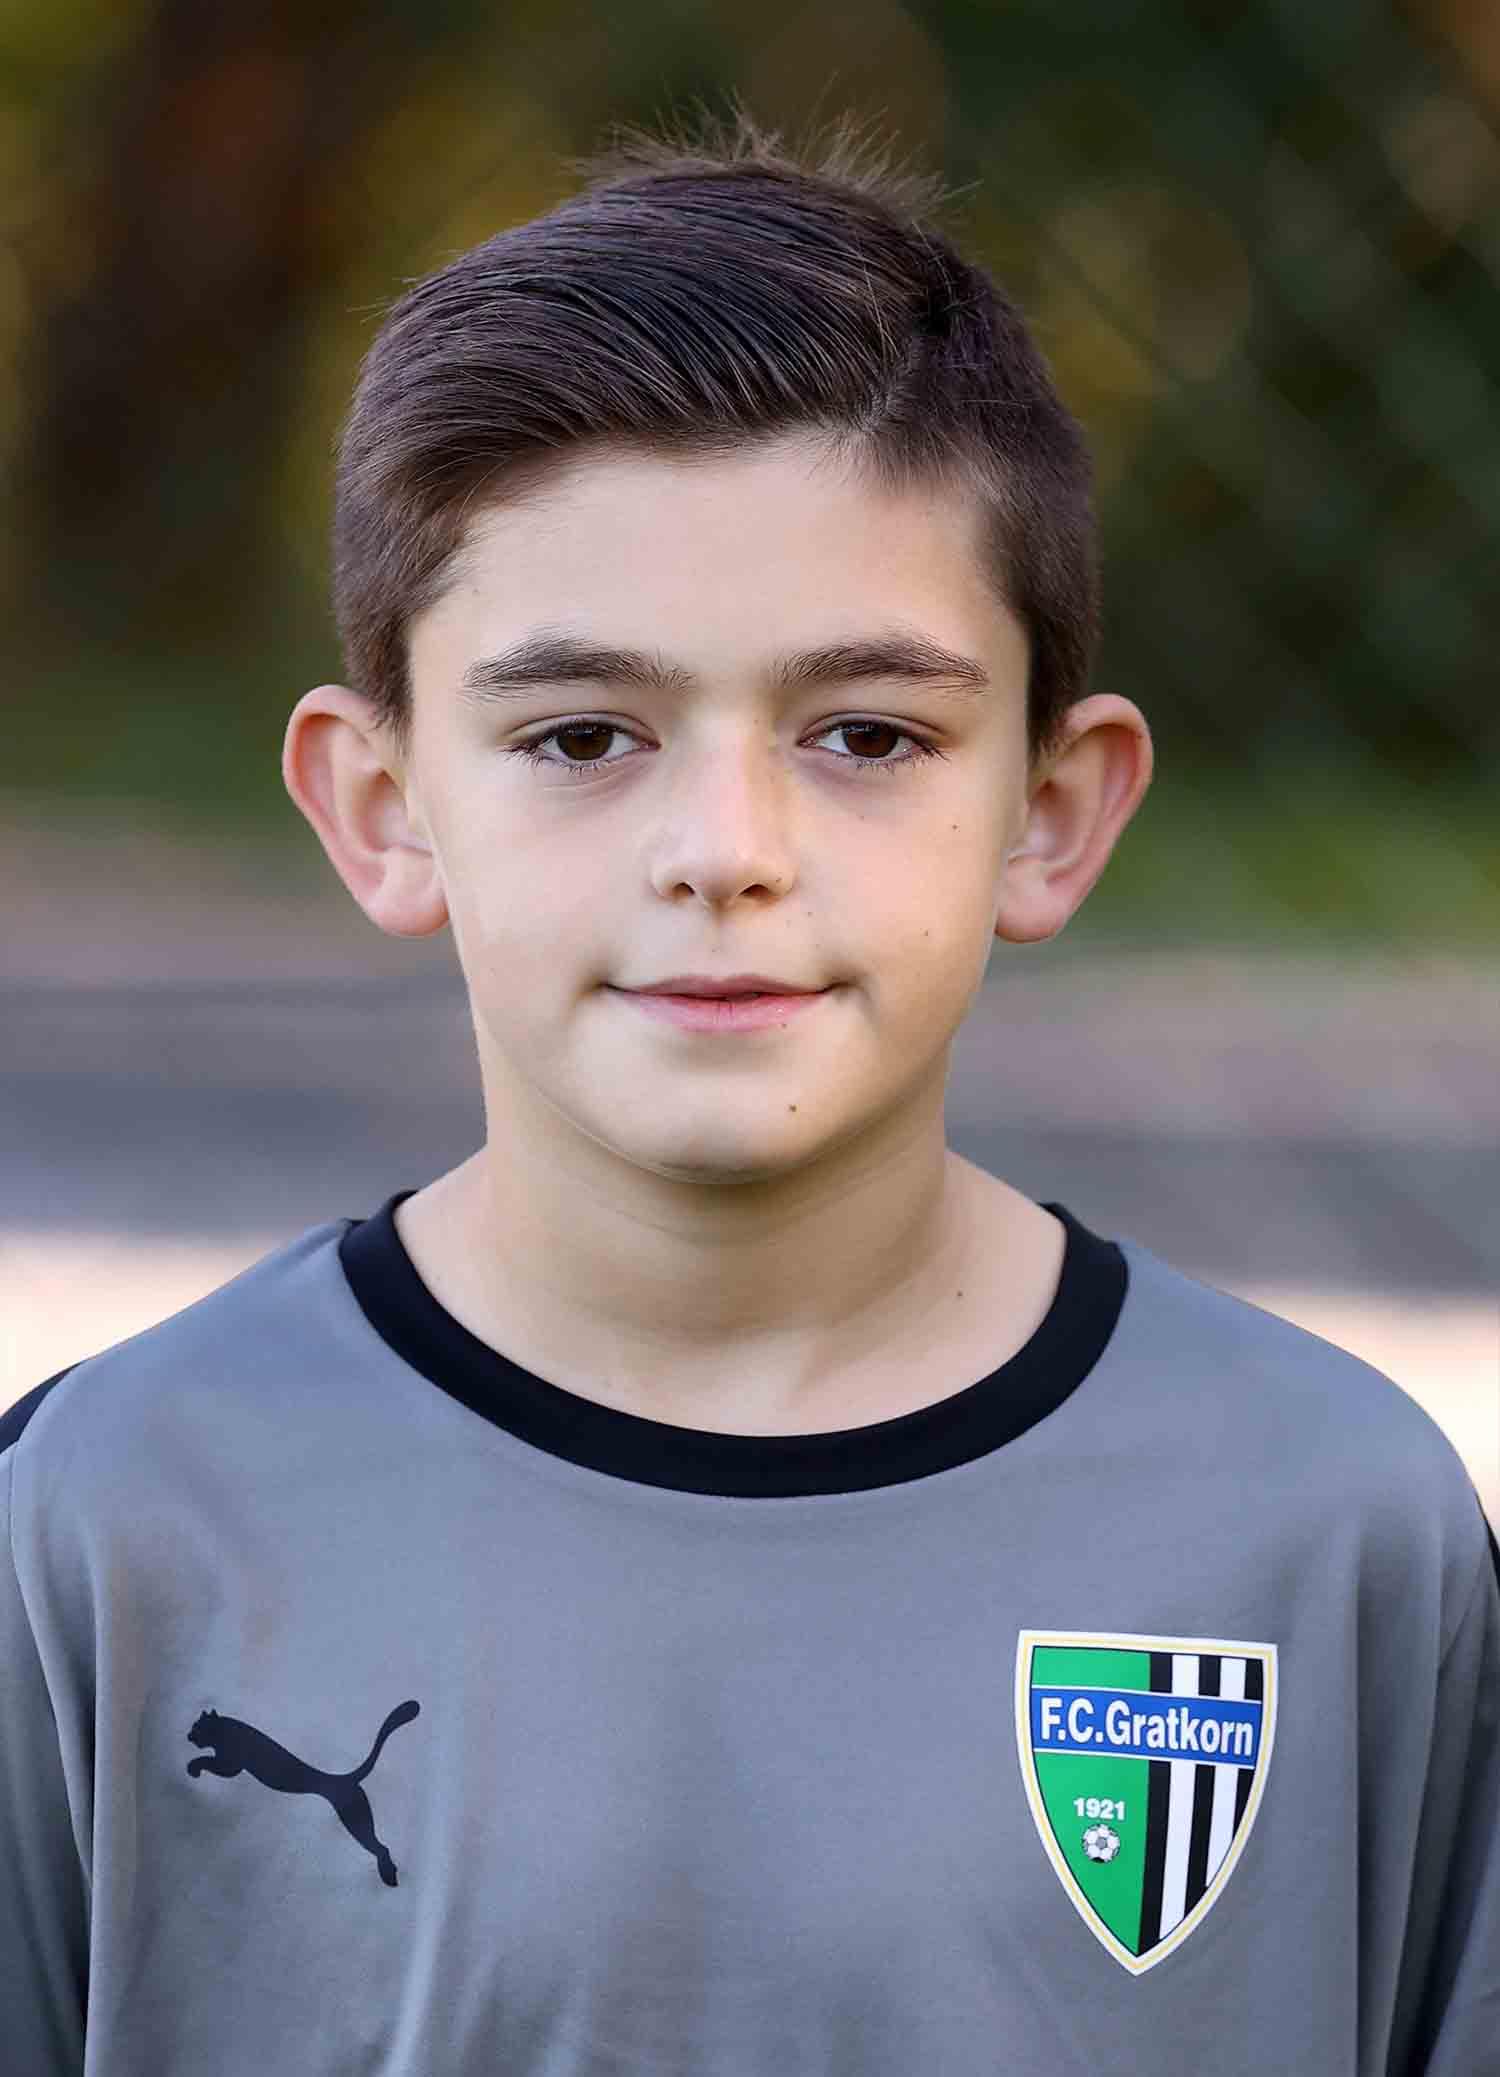 Alban Doroci, FC Gratkorn U13